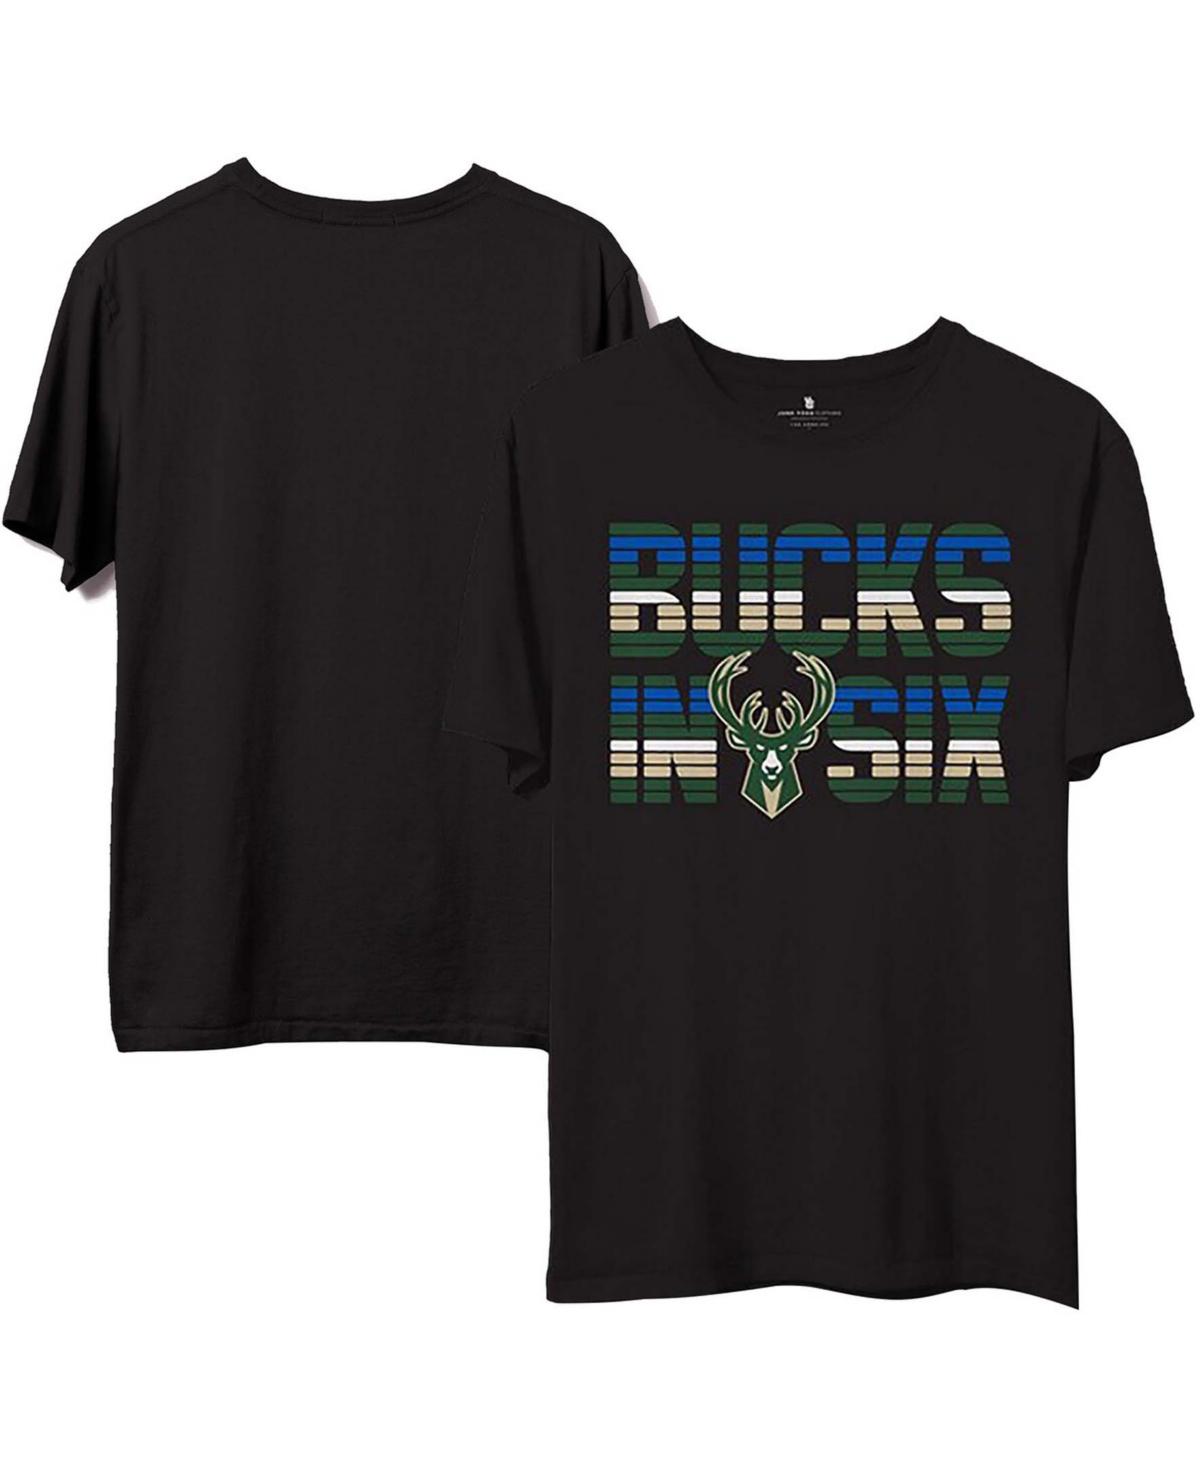 Men's Black Milwaukee Bucks 2021 Nba Finals Champions Bucks in Six T-shirt